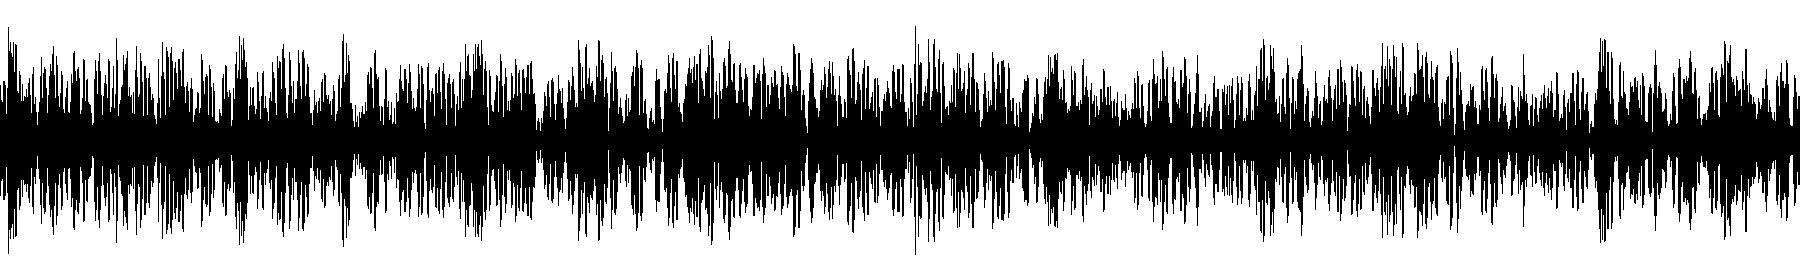 blbc cinedrums b fx 95 03